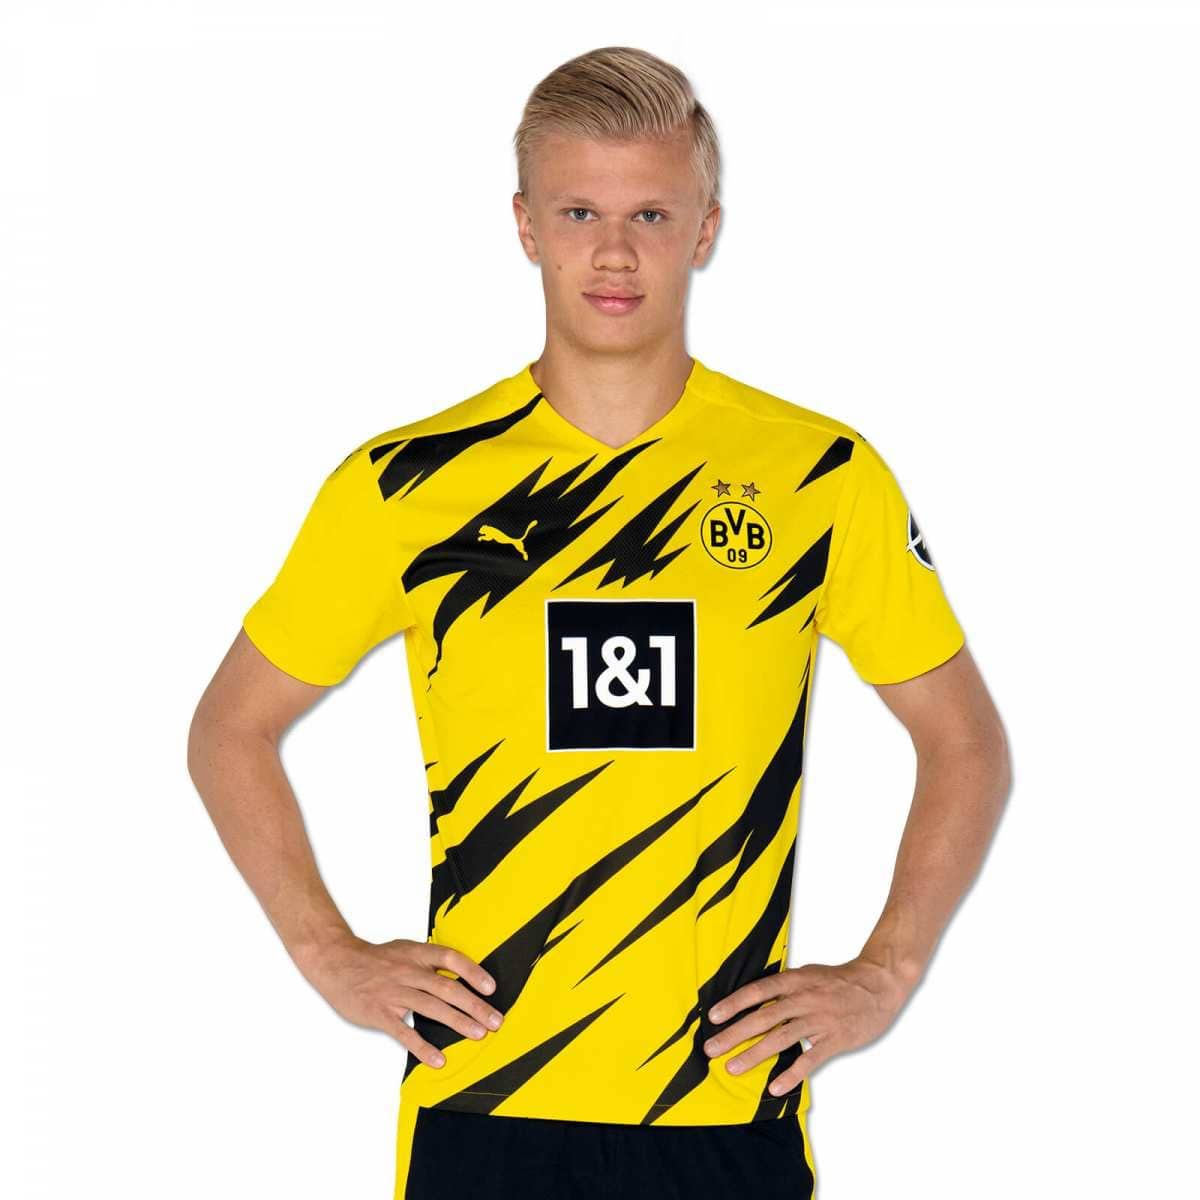 Borussia Dortmund 2020 21 Puma Home Kit The Kitman